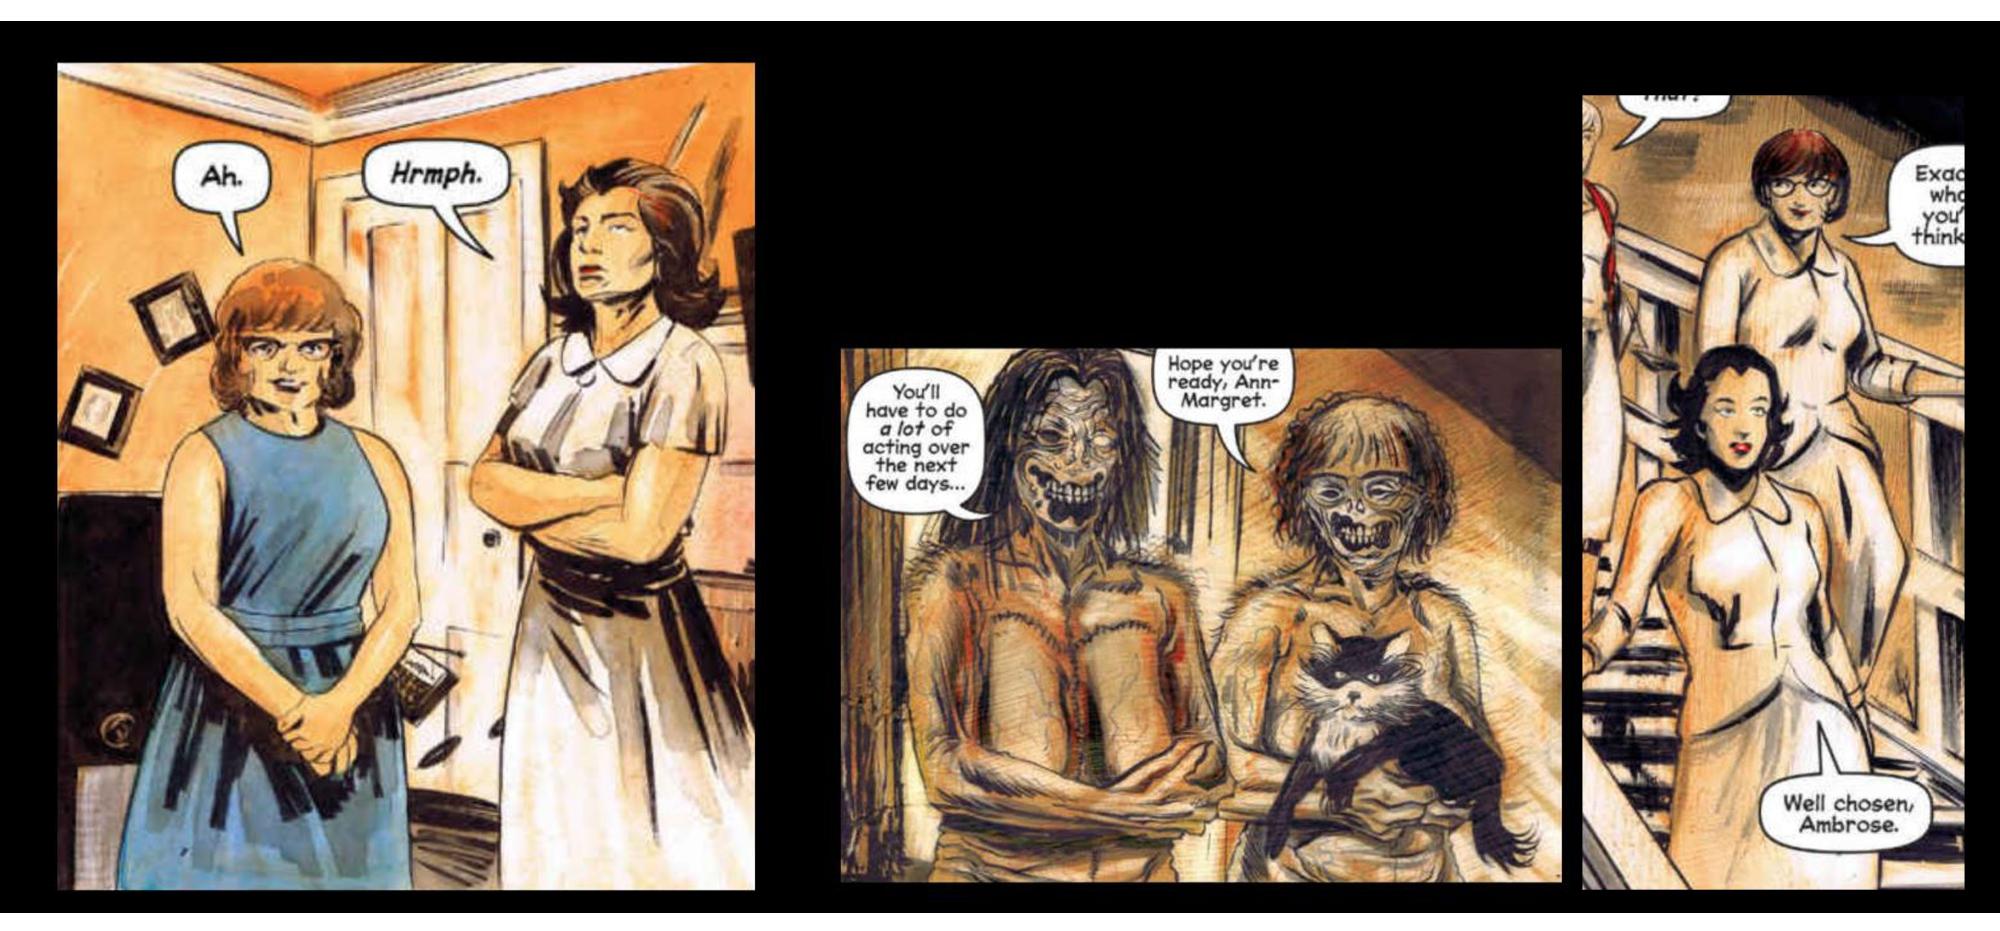 https://talilifestyle.com/2019/05/24/chilling-adventures-of-sabrina-:-t-v-show-comic-comparison